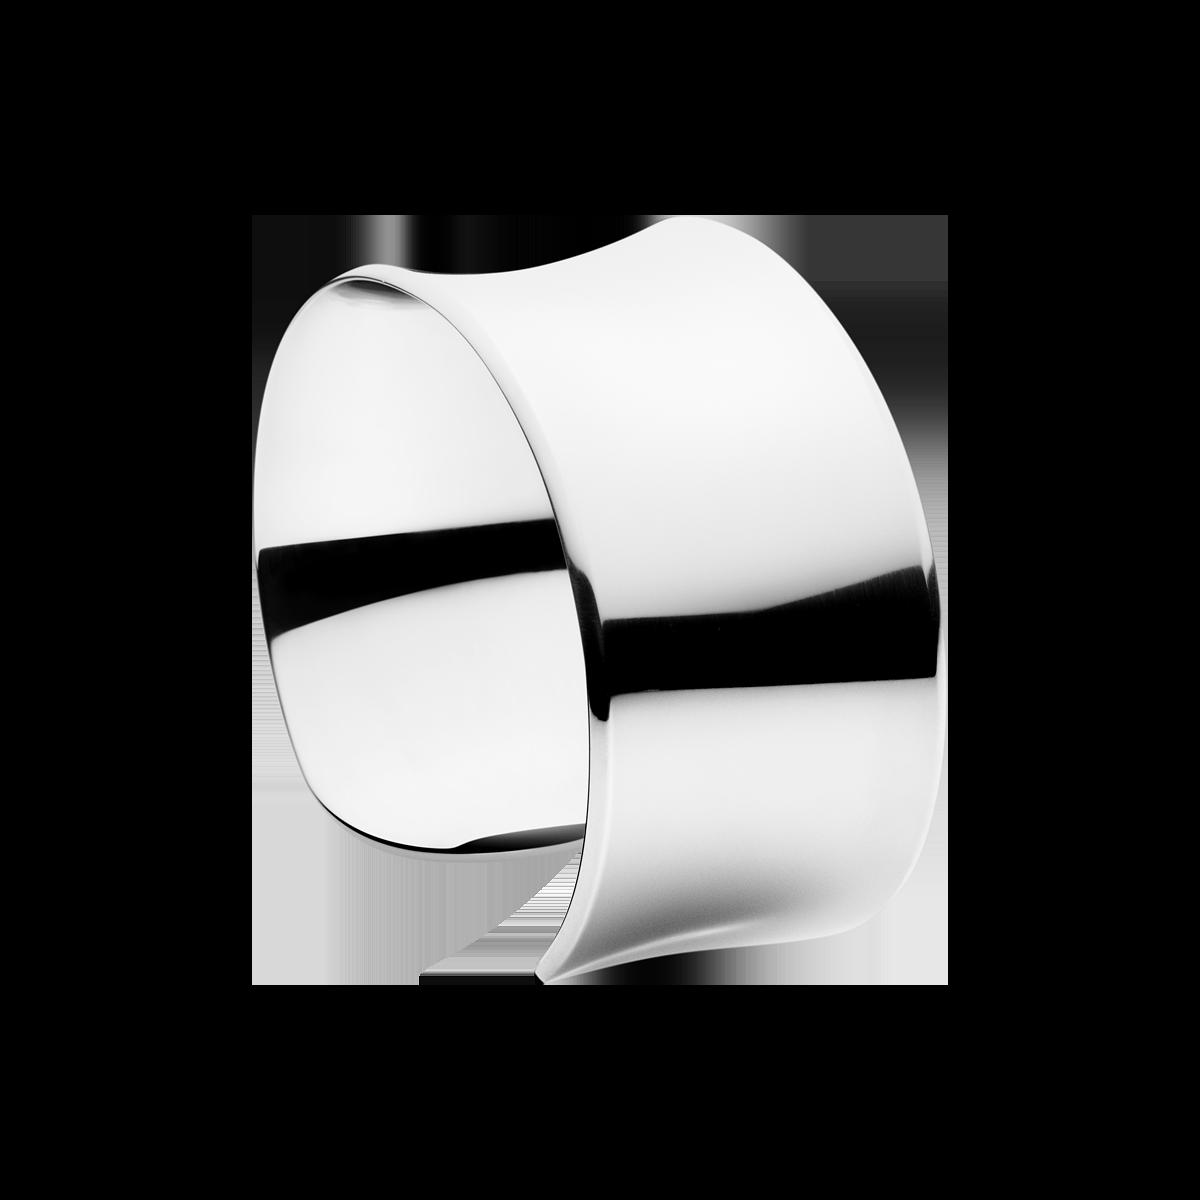 Georg Jensen Smithy Cuffs armring